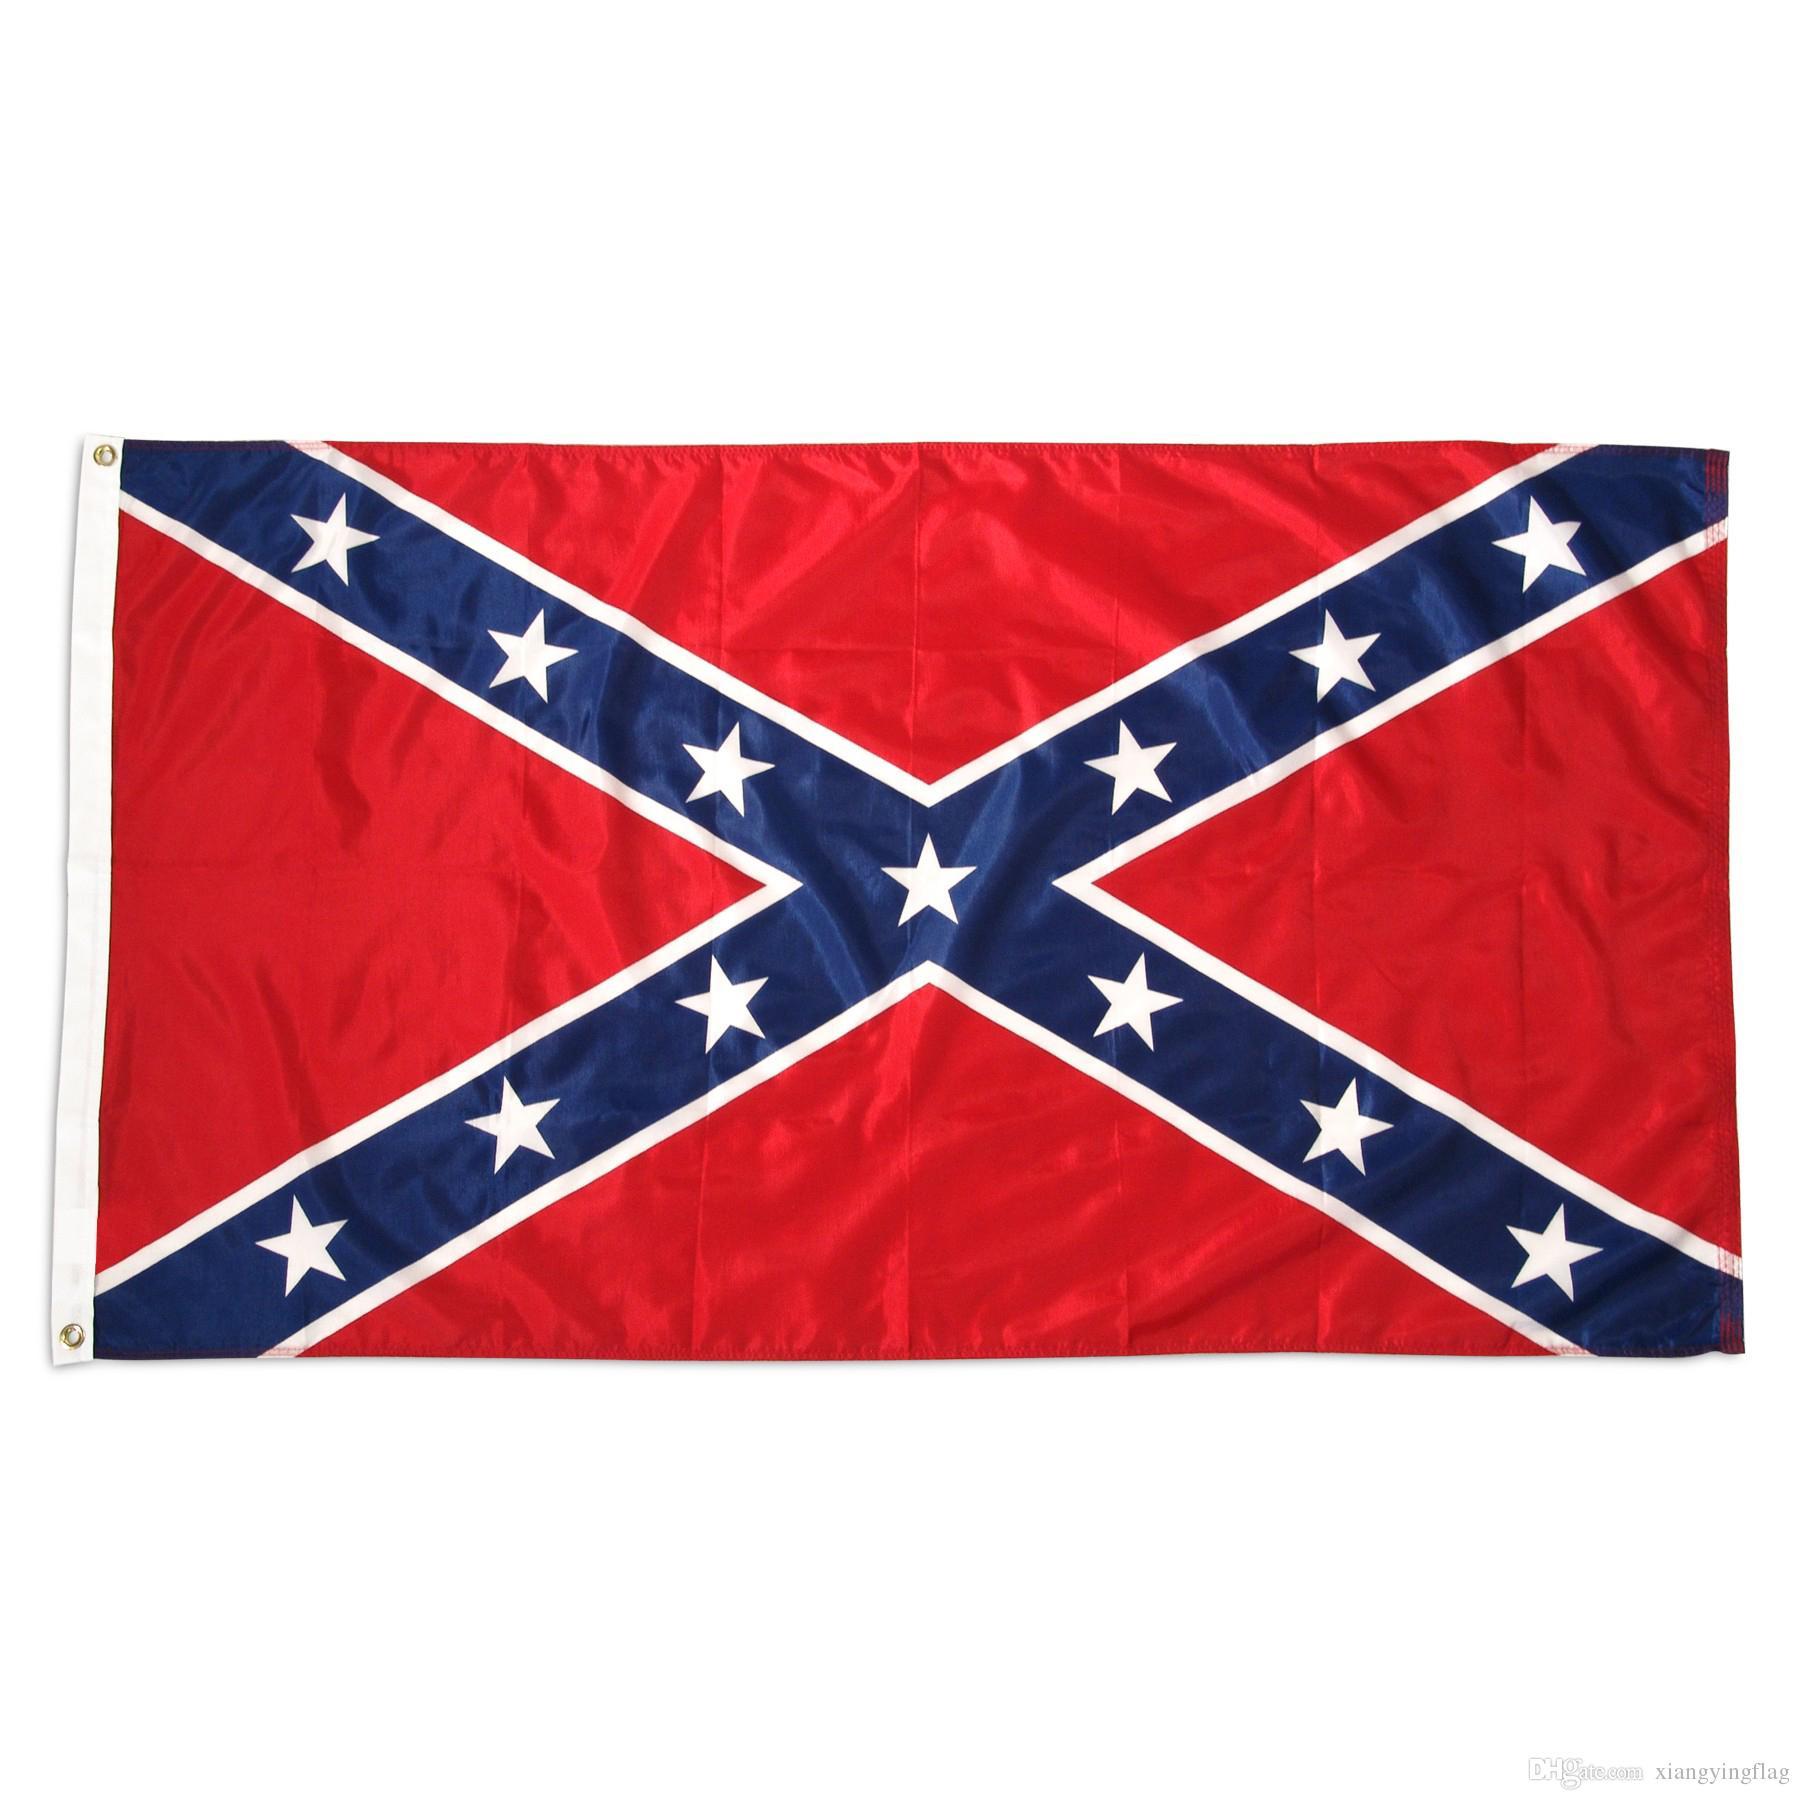 direct factory US 90x150 cm 3x5 ft civil War battle army Confederate Rebel Flag